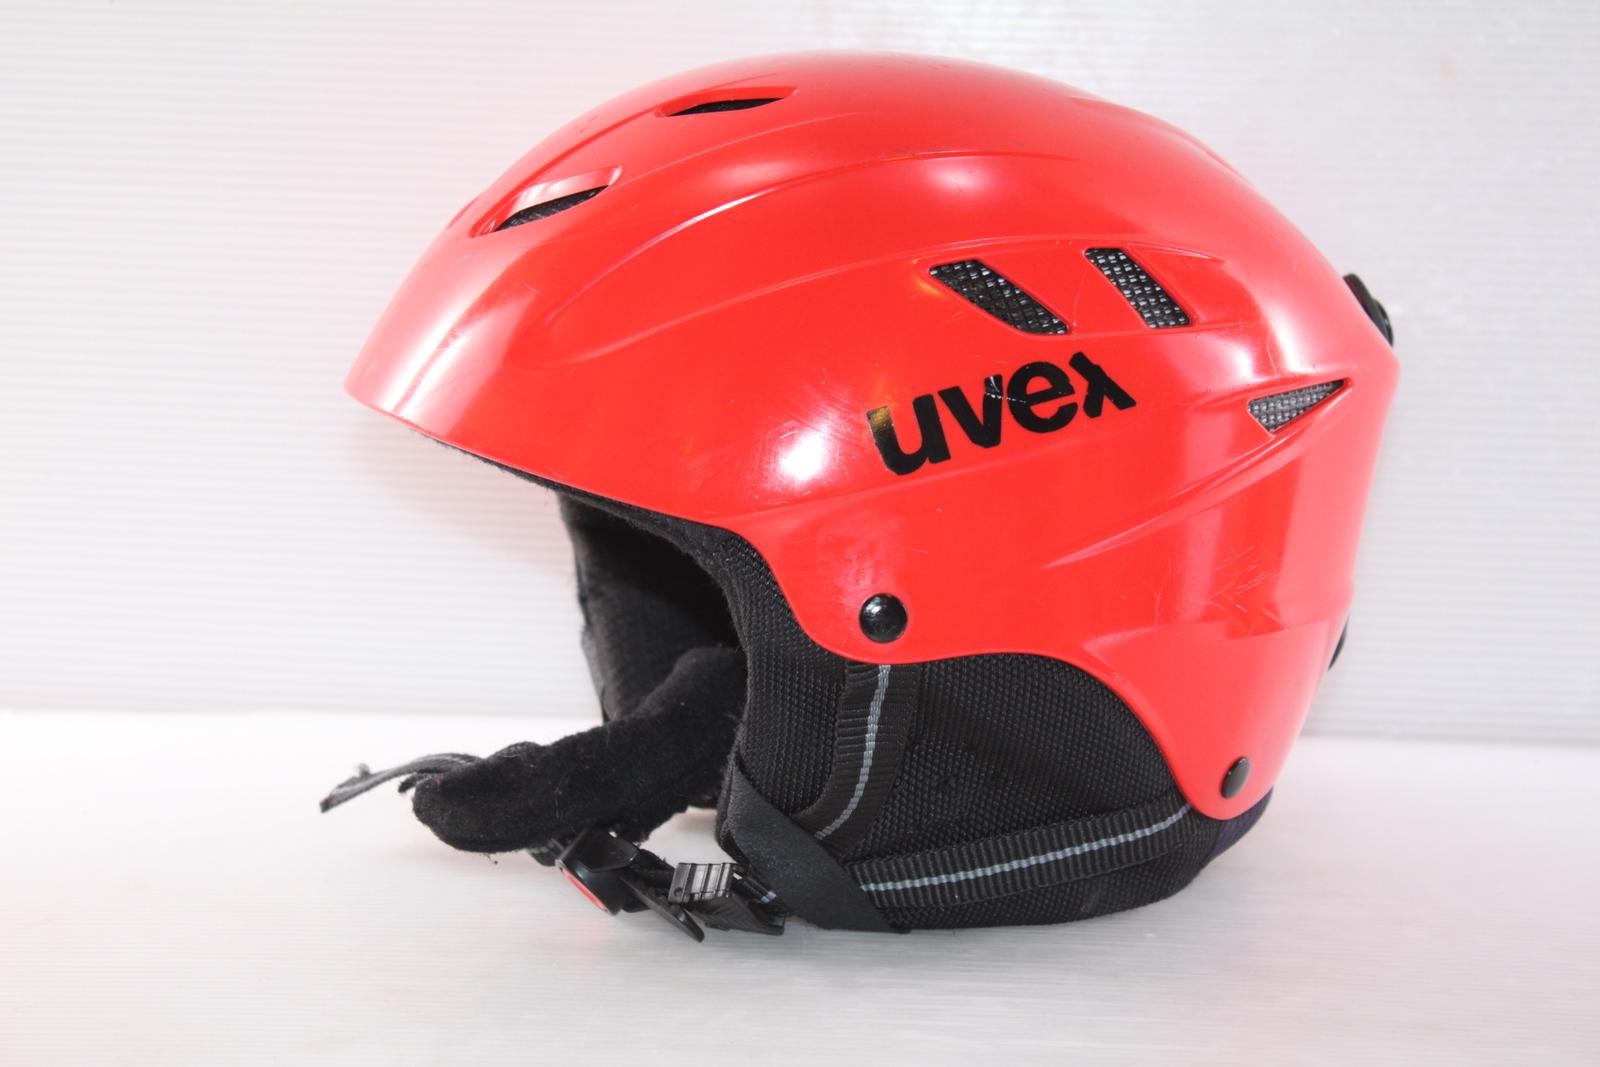 Dětská lyžařská helma Uvex Uvex - posuvná vel. 51 - 56